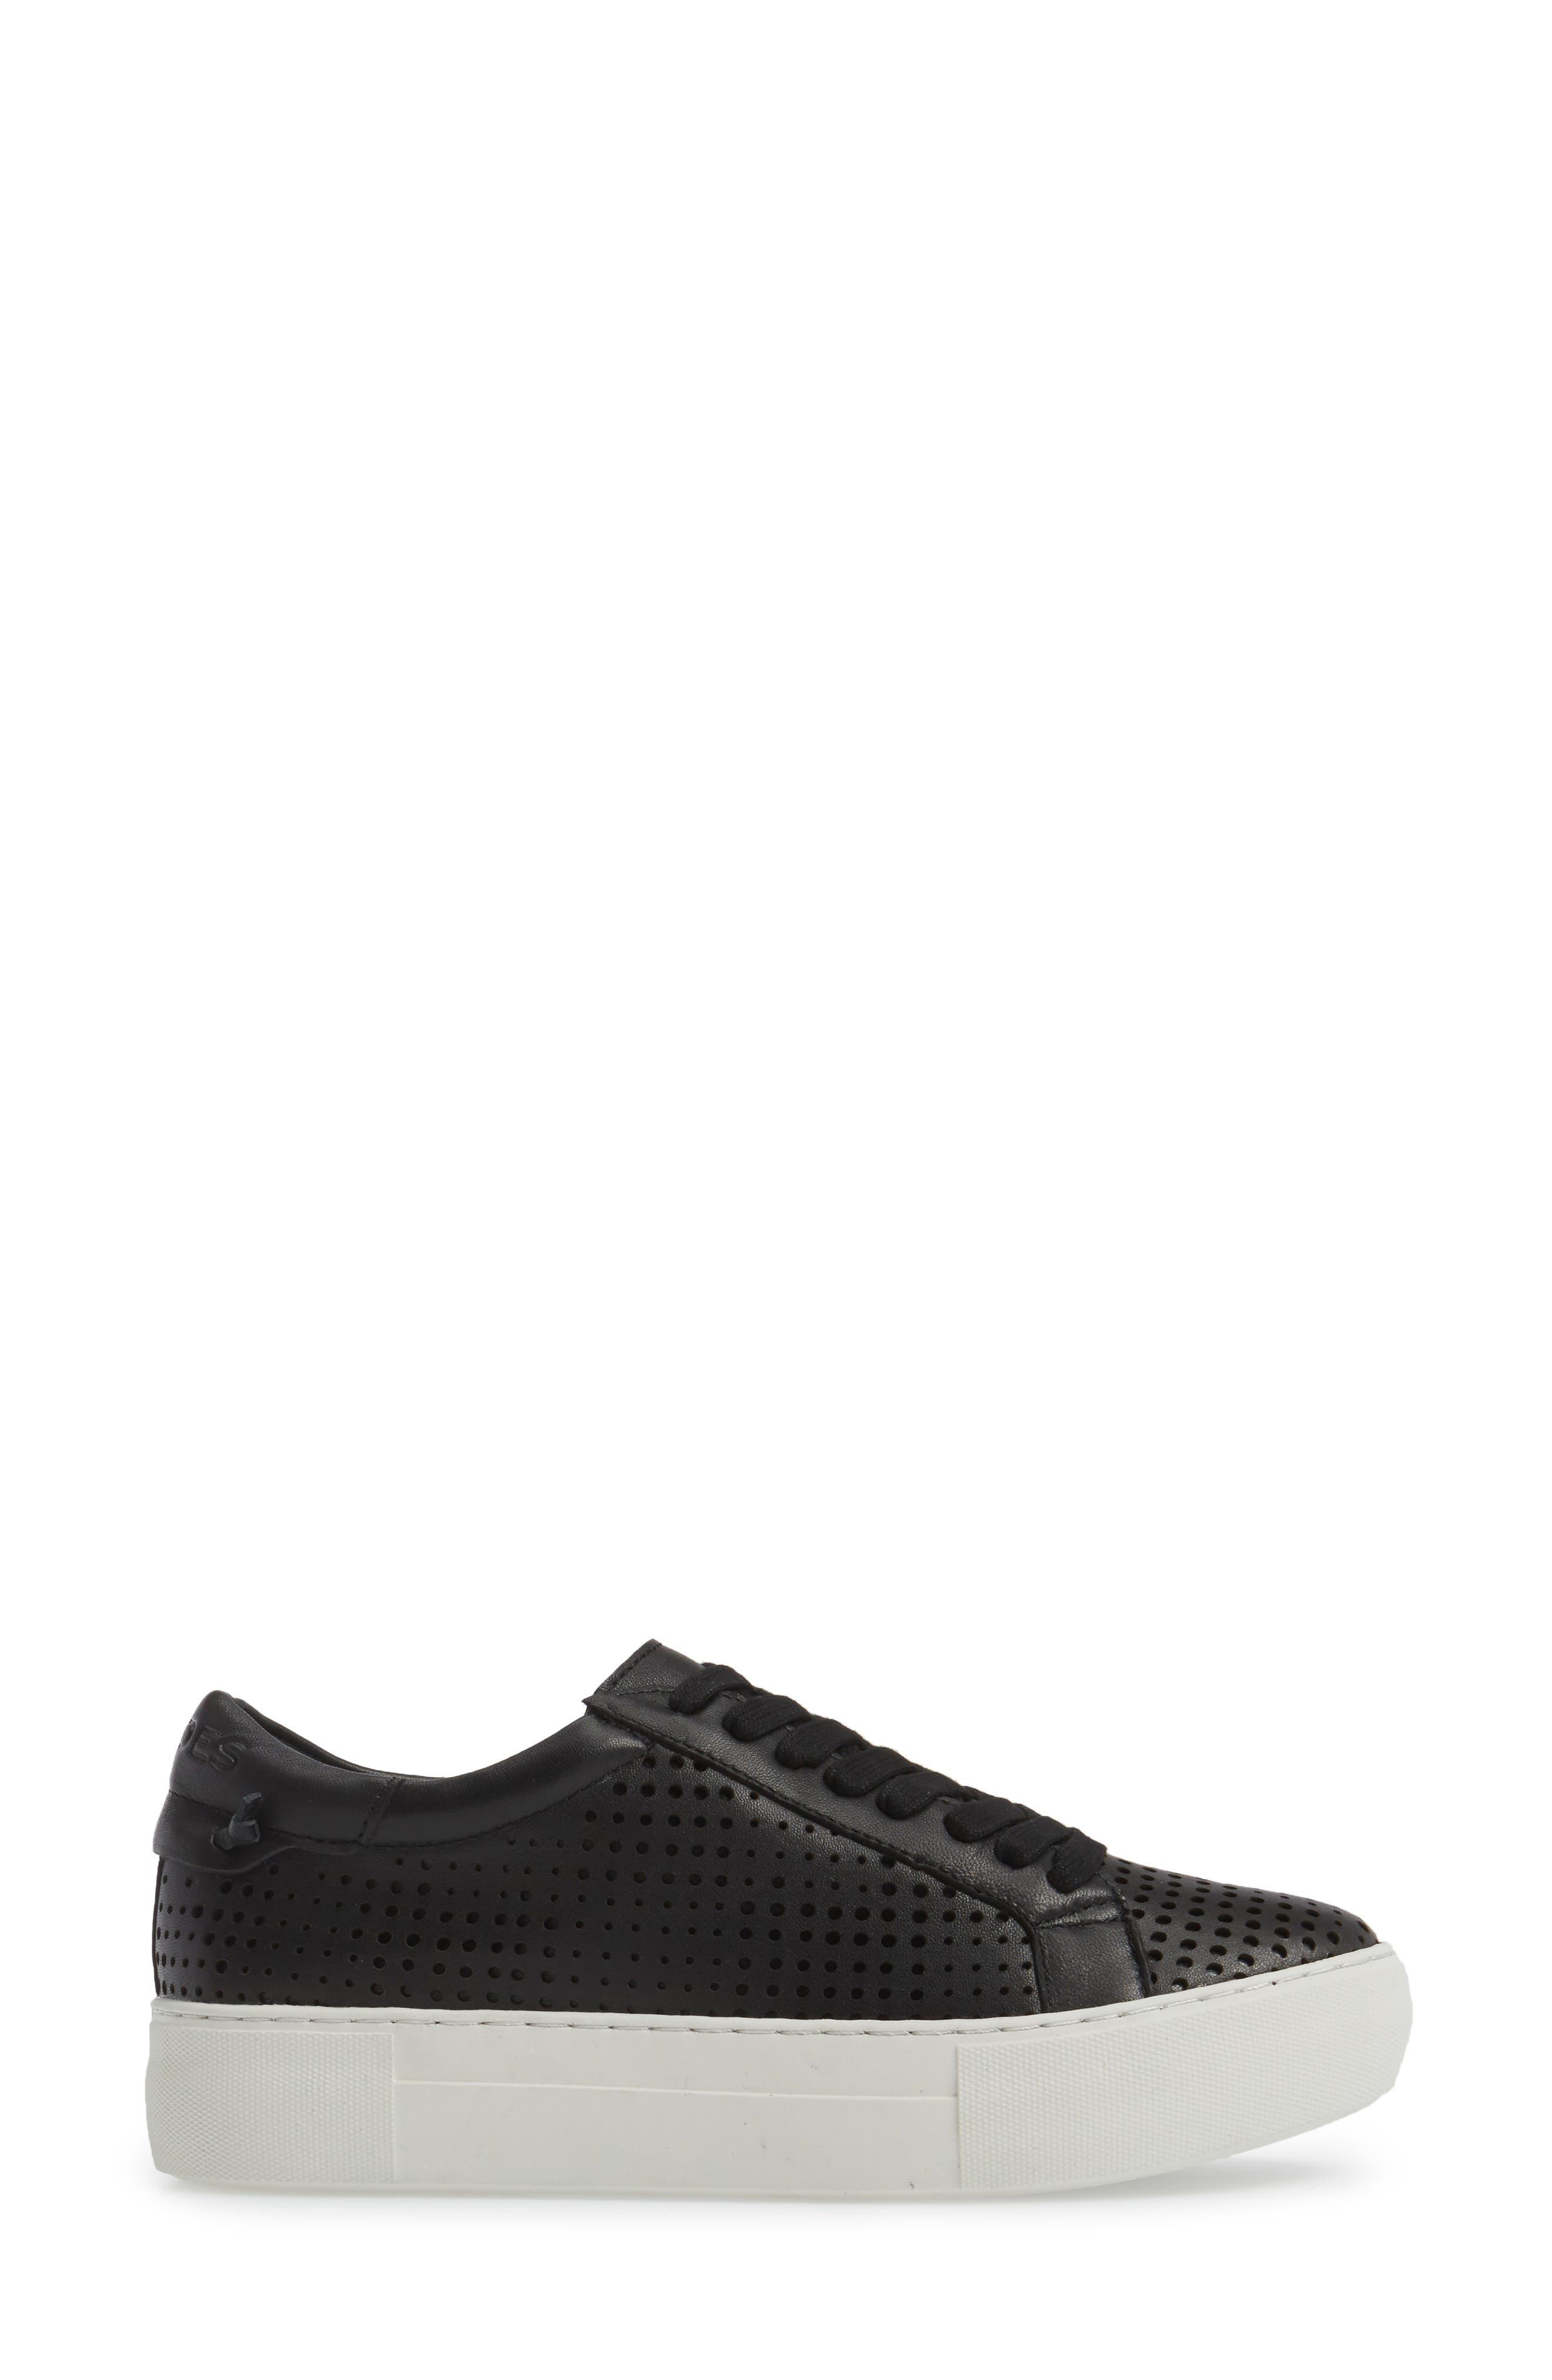 Alternate Image 3  - JSlides Audrina Platform Sneaker (Women)